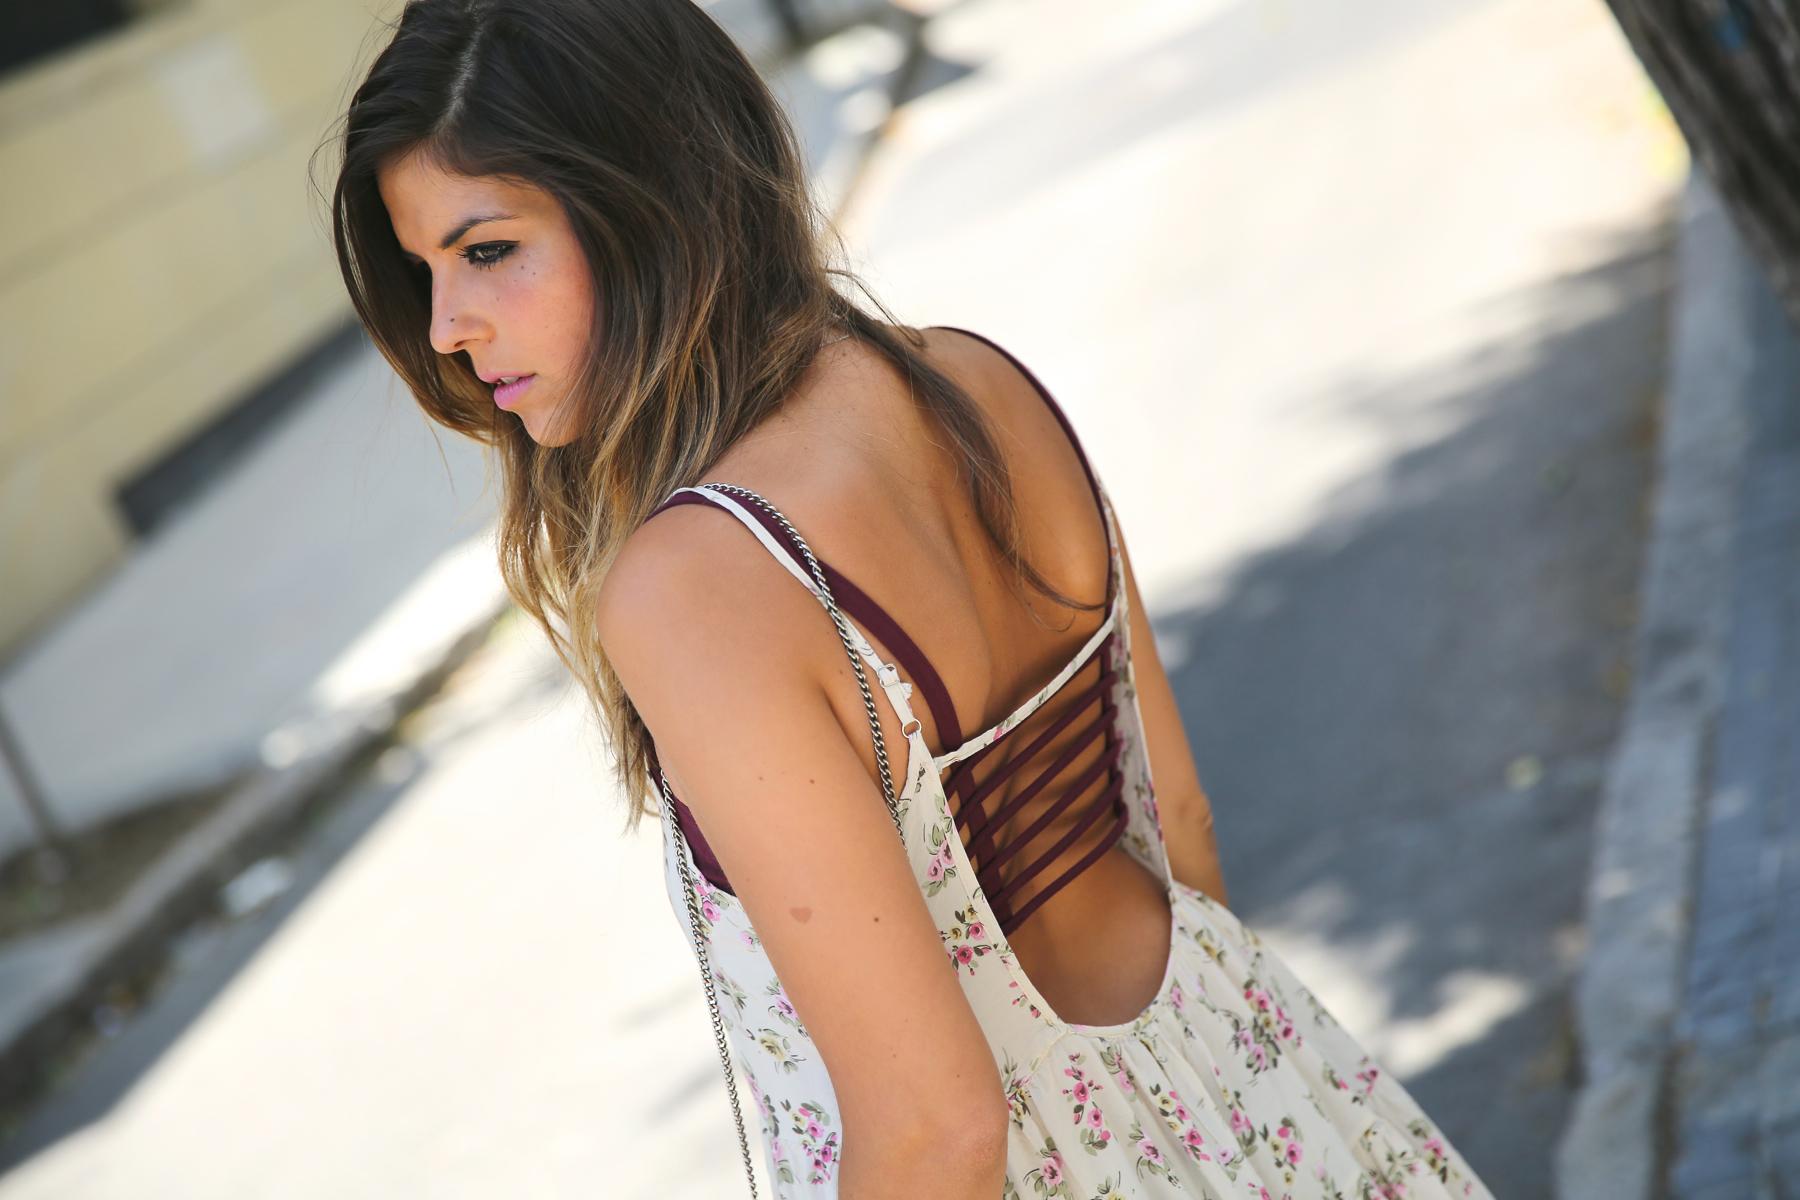 trendy_taste-look-outfit-street_style-ootd-blog-blogger-fashion_spain-moda_españa-vince_camuto-botines_granates-burgundy_booties-flower_print-estampado_flores-silver_bag-bolso_plata-estampado_flores-boho-top-4